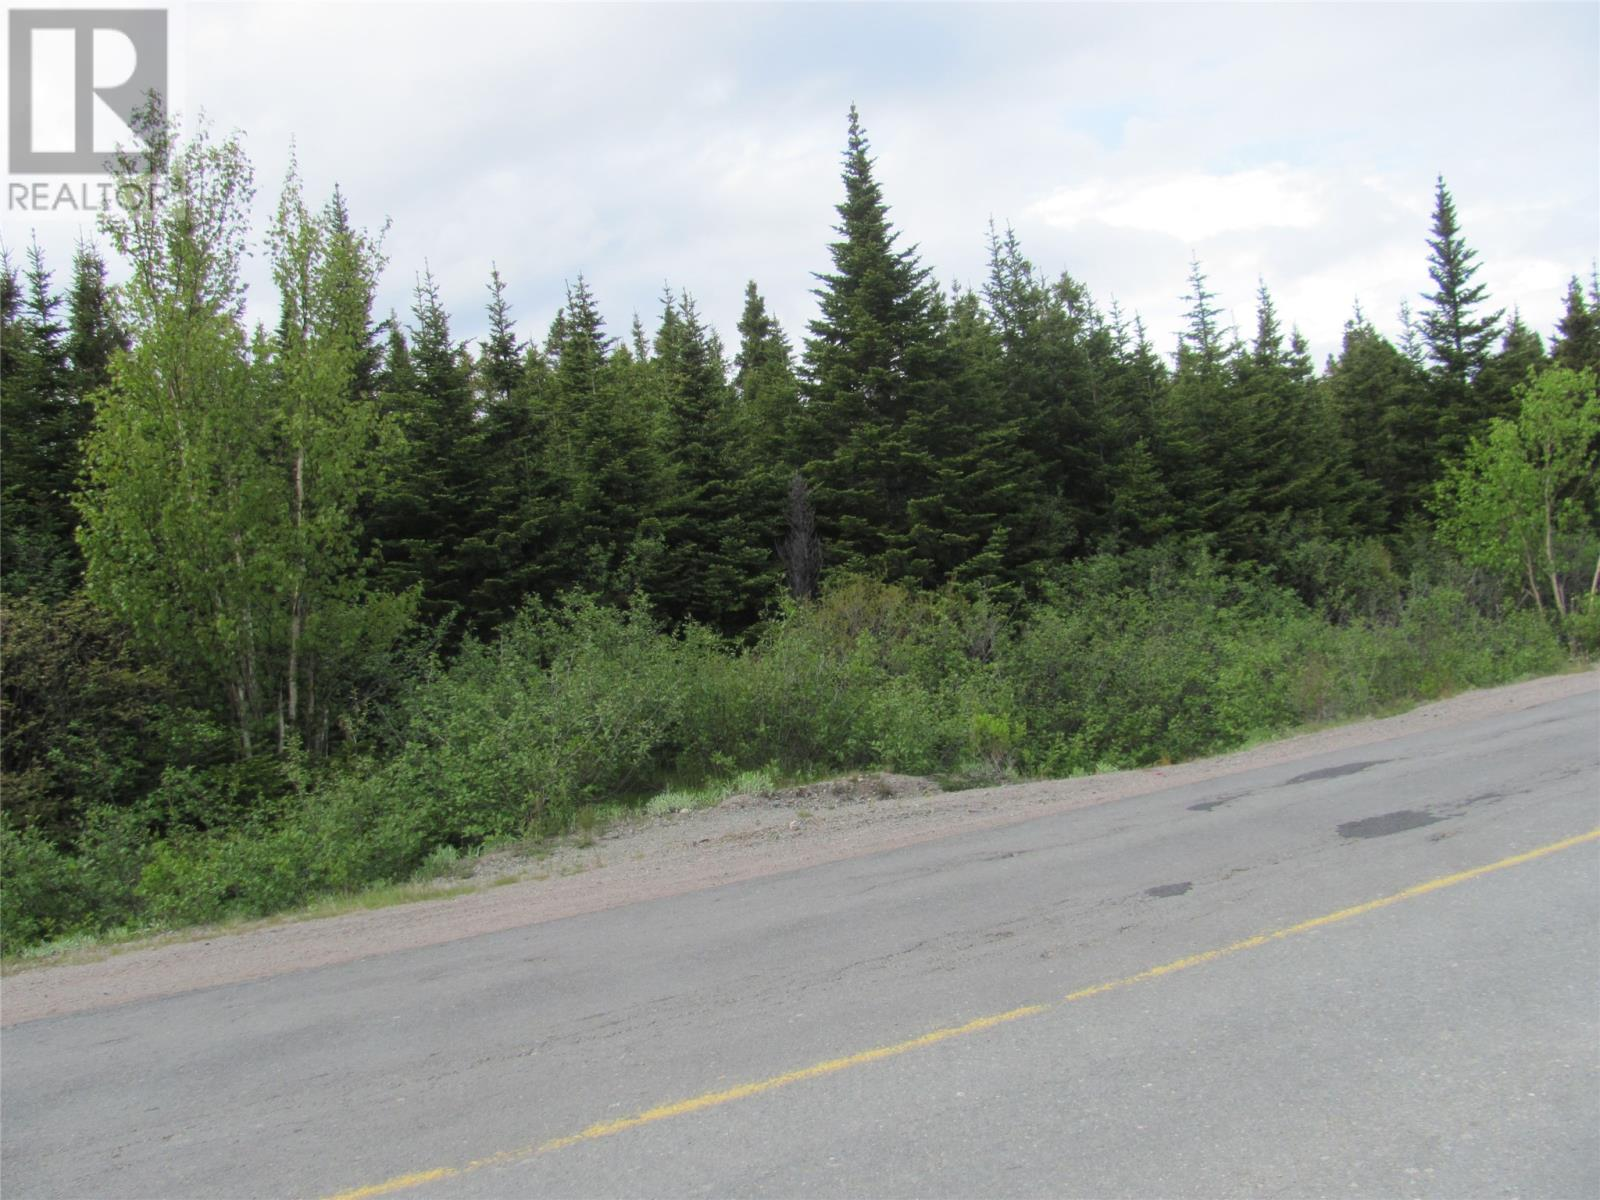 301-307 John Cabot Drive, Bonavista, Newfoundland & Labrador  A0C 1B0 - Photo 1 - 1198494